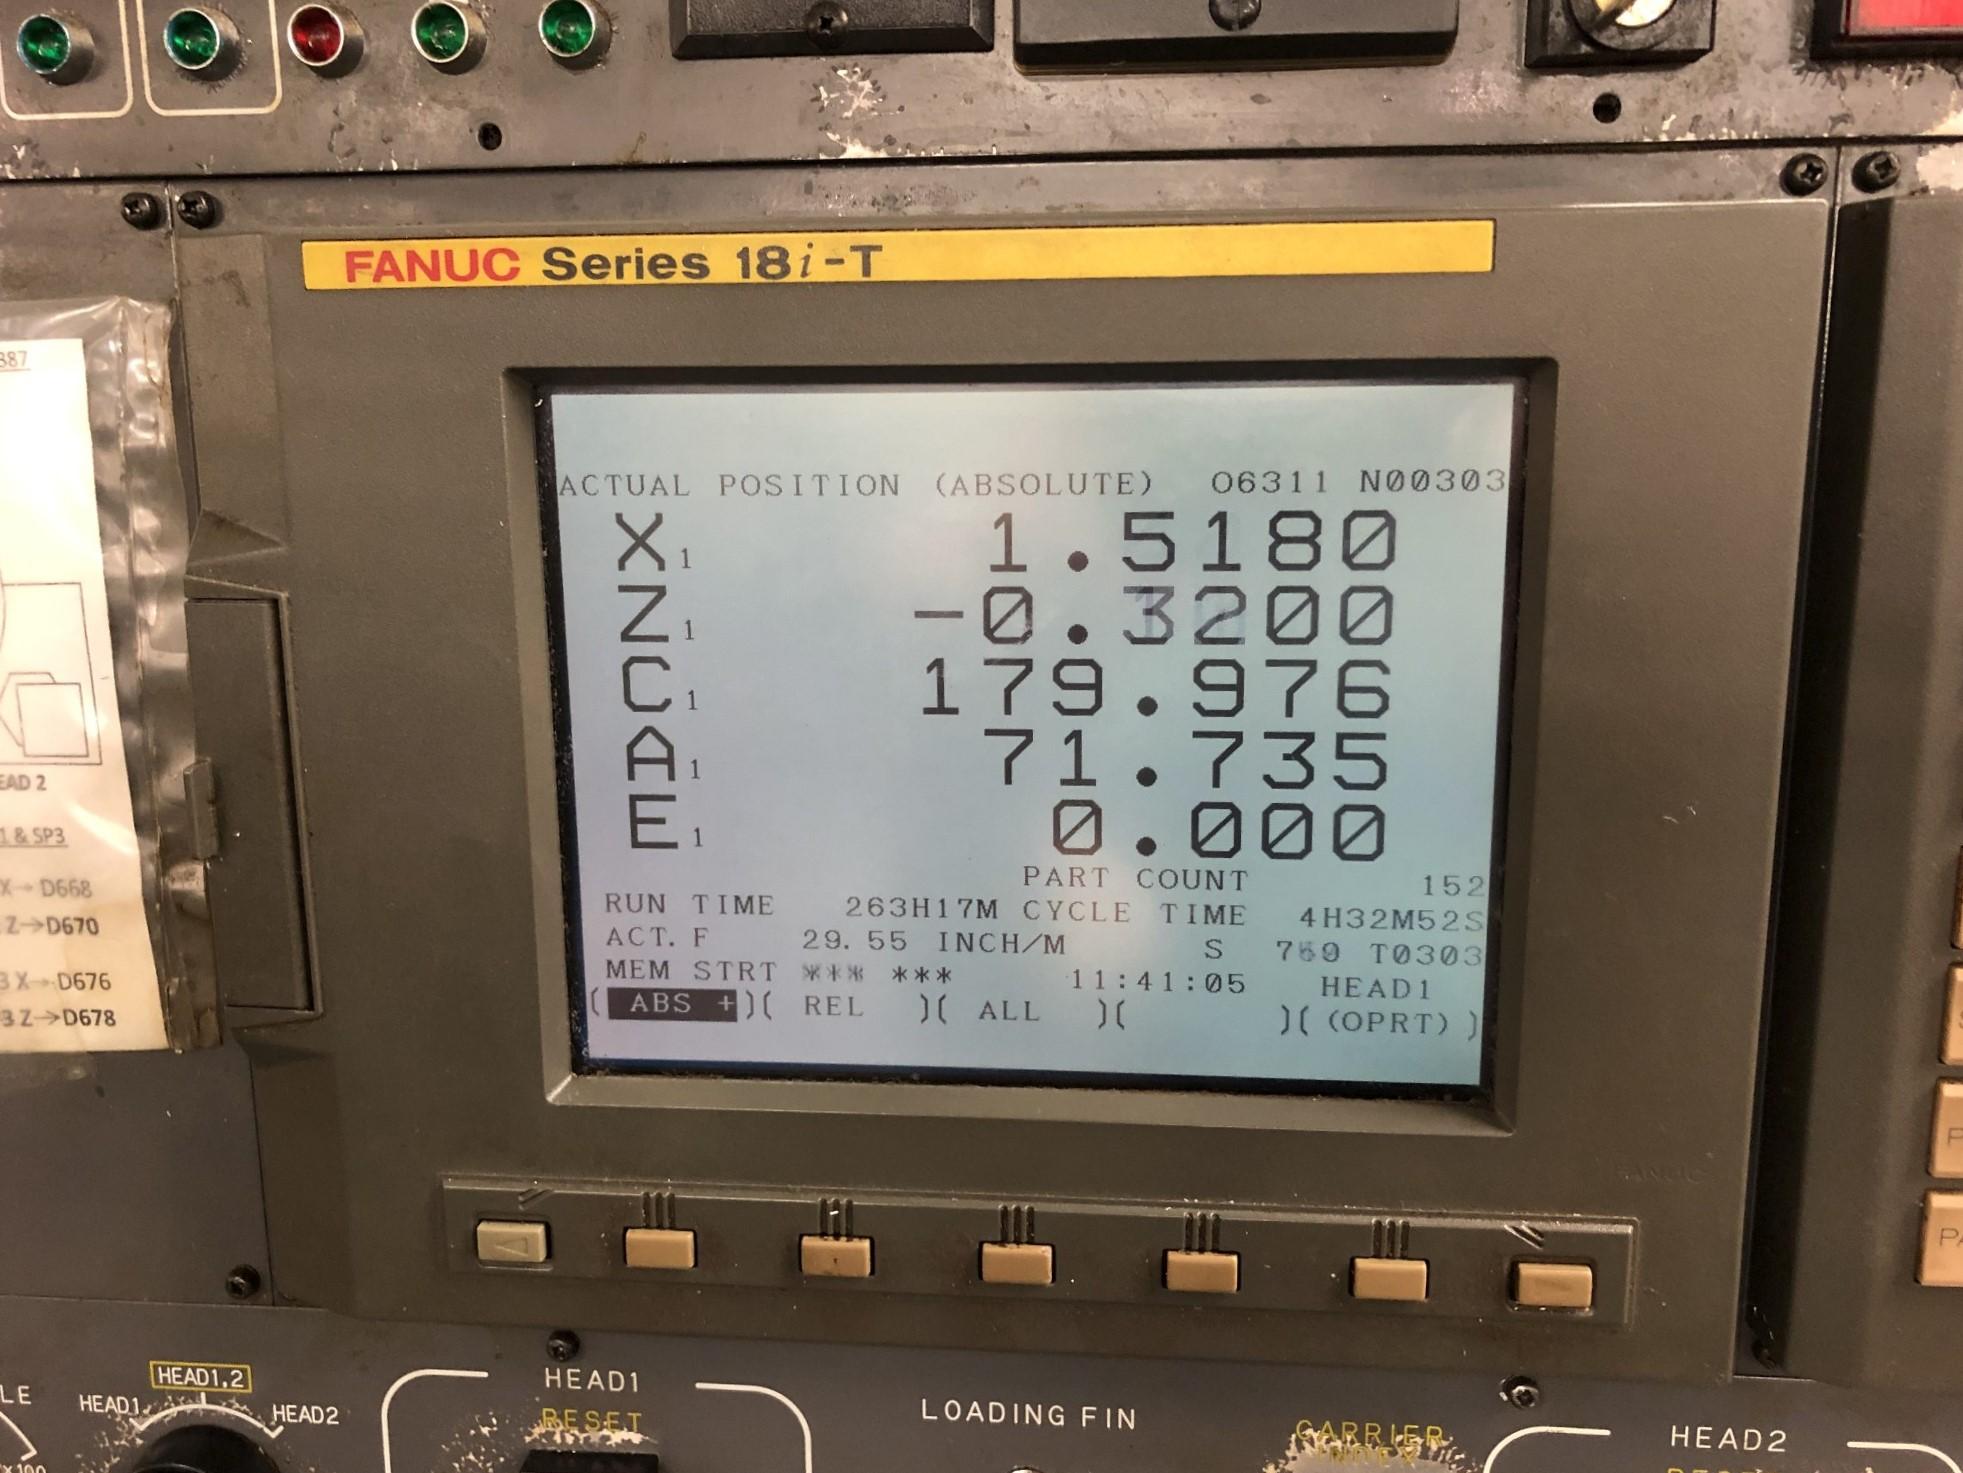 1999 Kitako MT4-200M Multi-Spindle CNC Turning Mill - Image 5 of 15